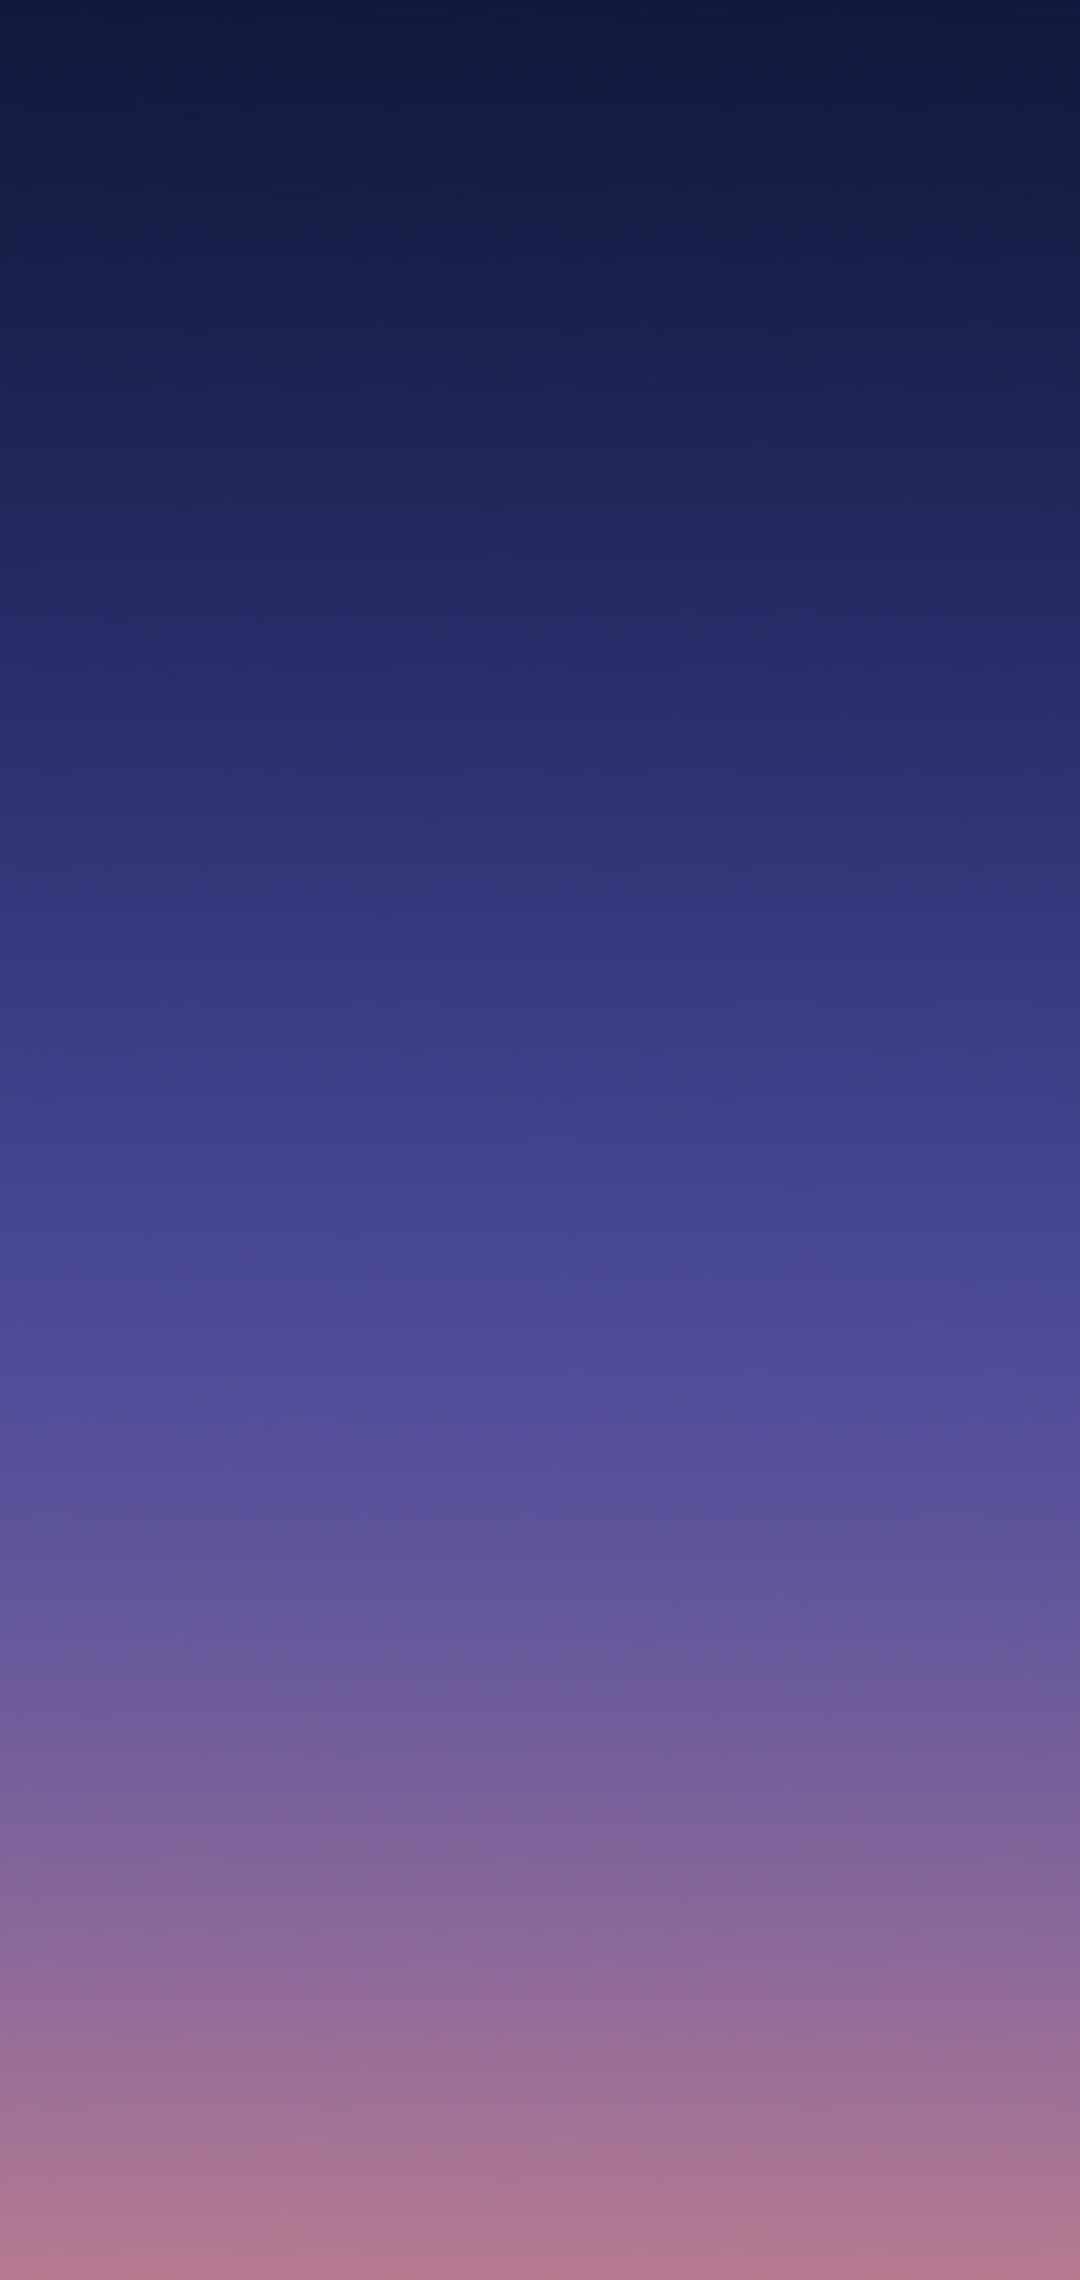 5000 Wallpaper Hd Xiaomi Redmi 6a HD Terbaik